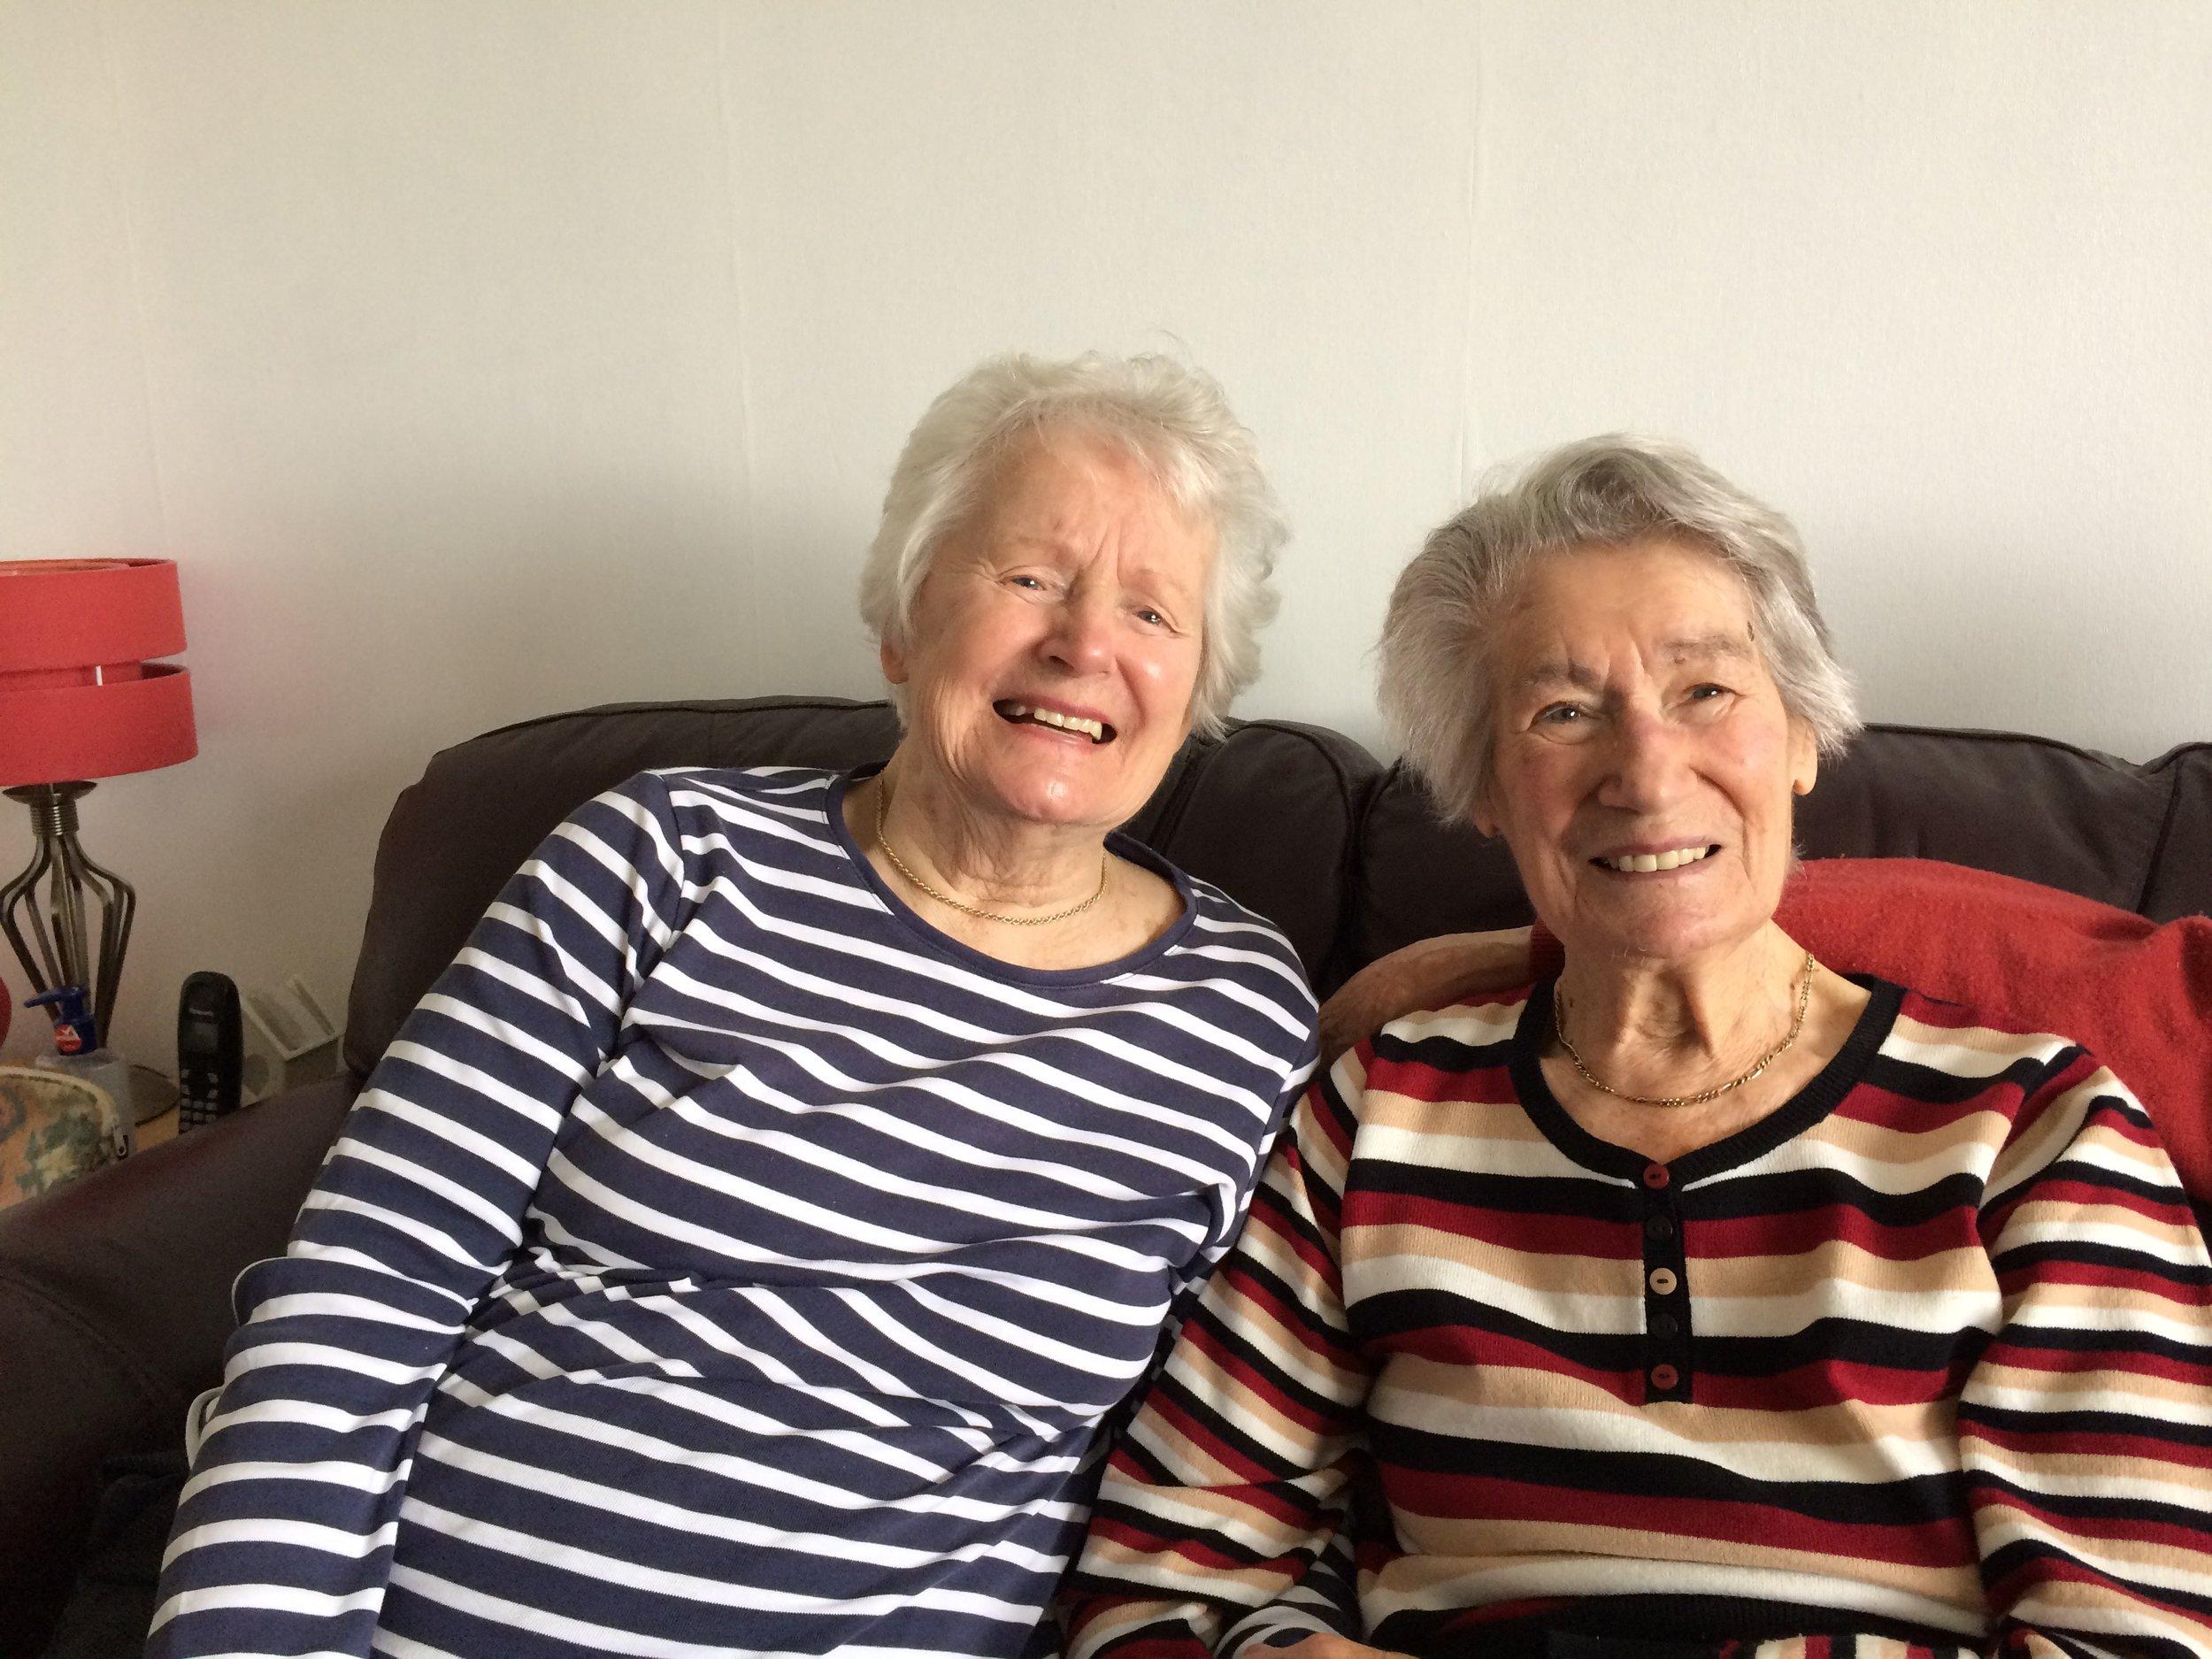 My fabulous aunties, Aunty Margaret and Aunty Gwyn